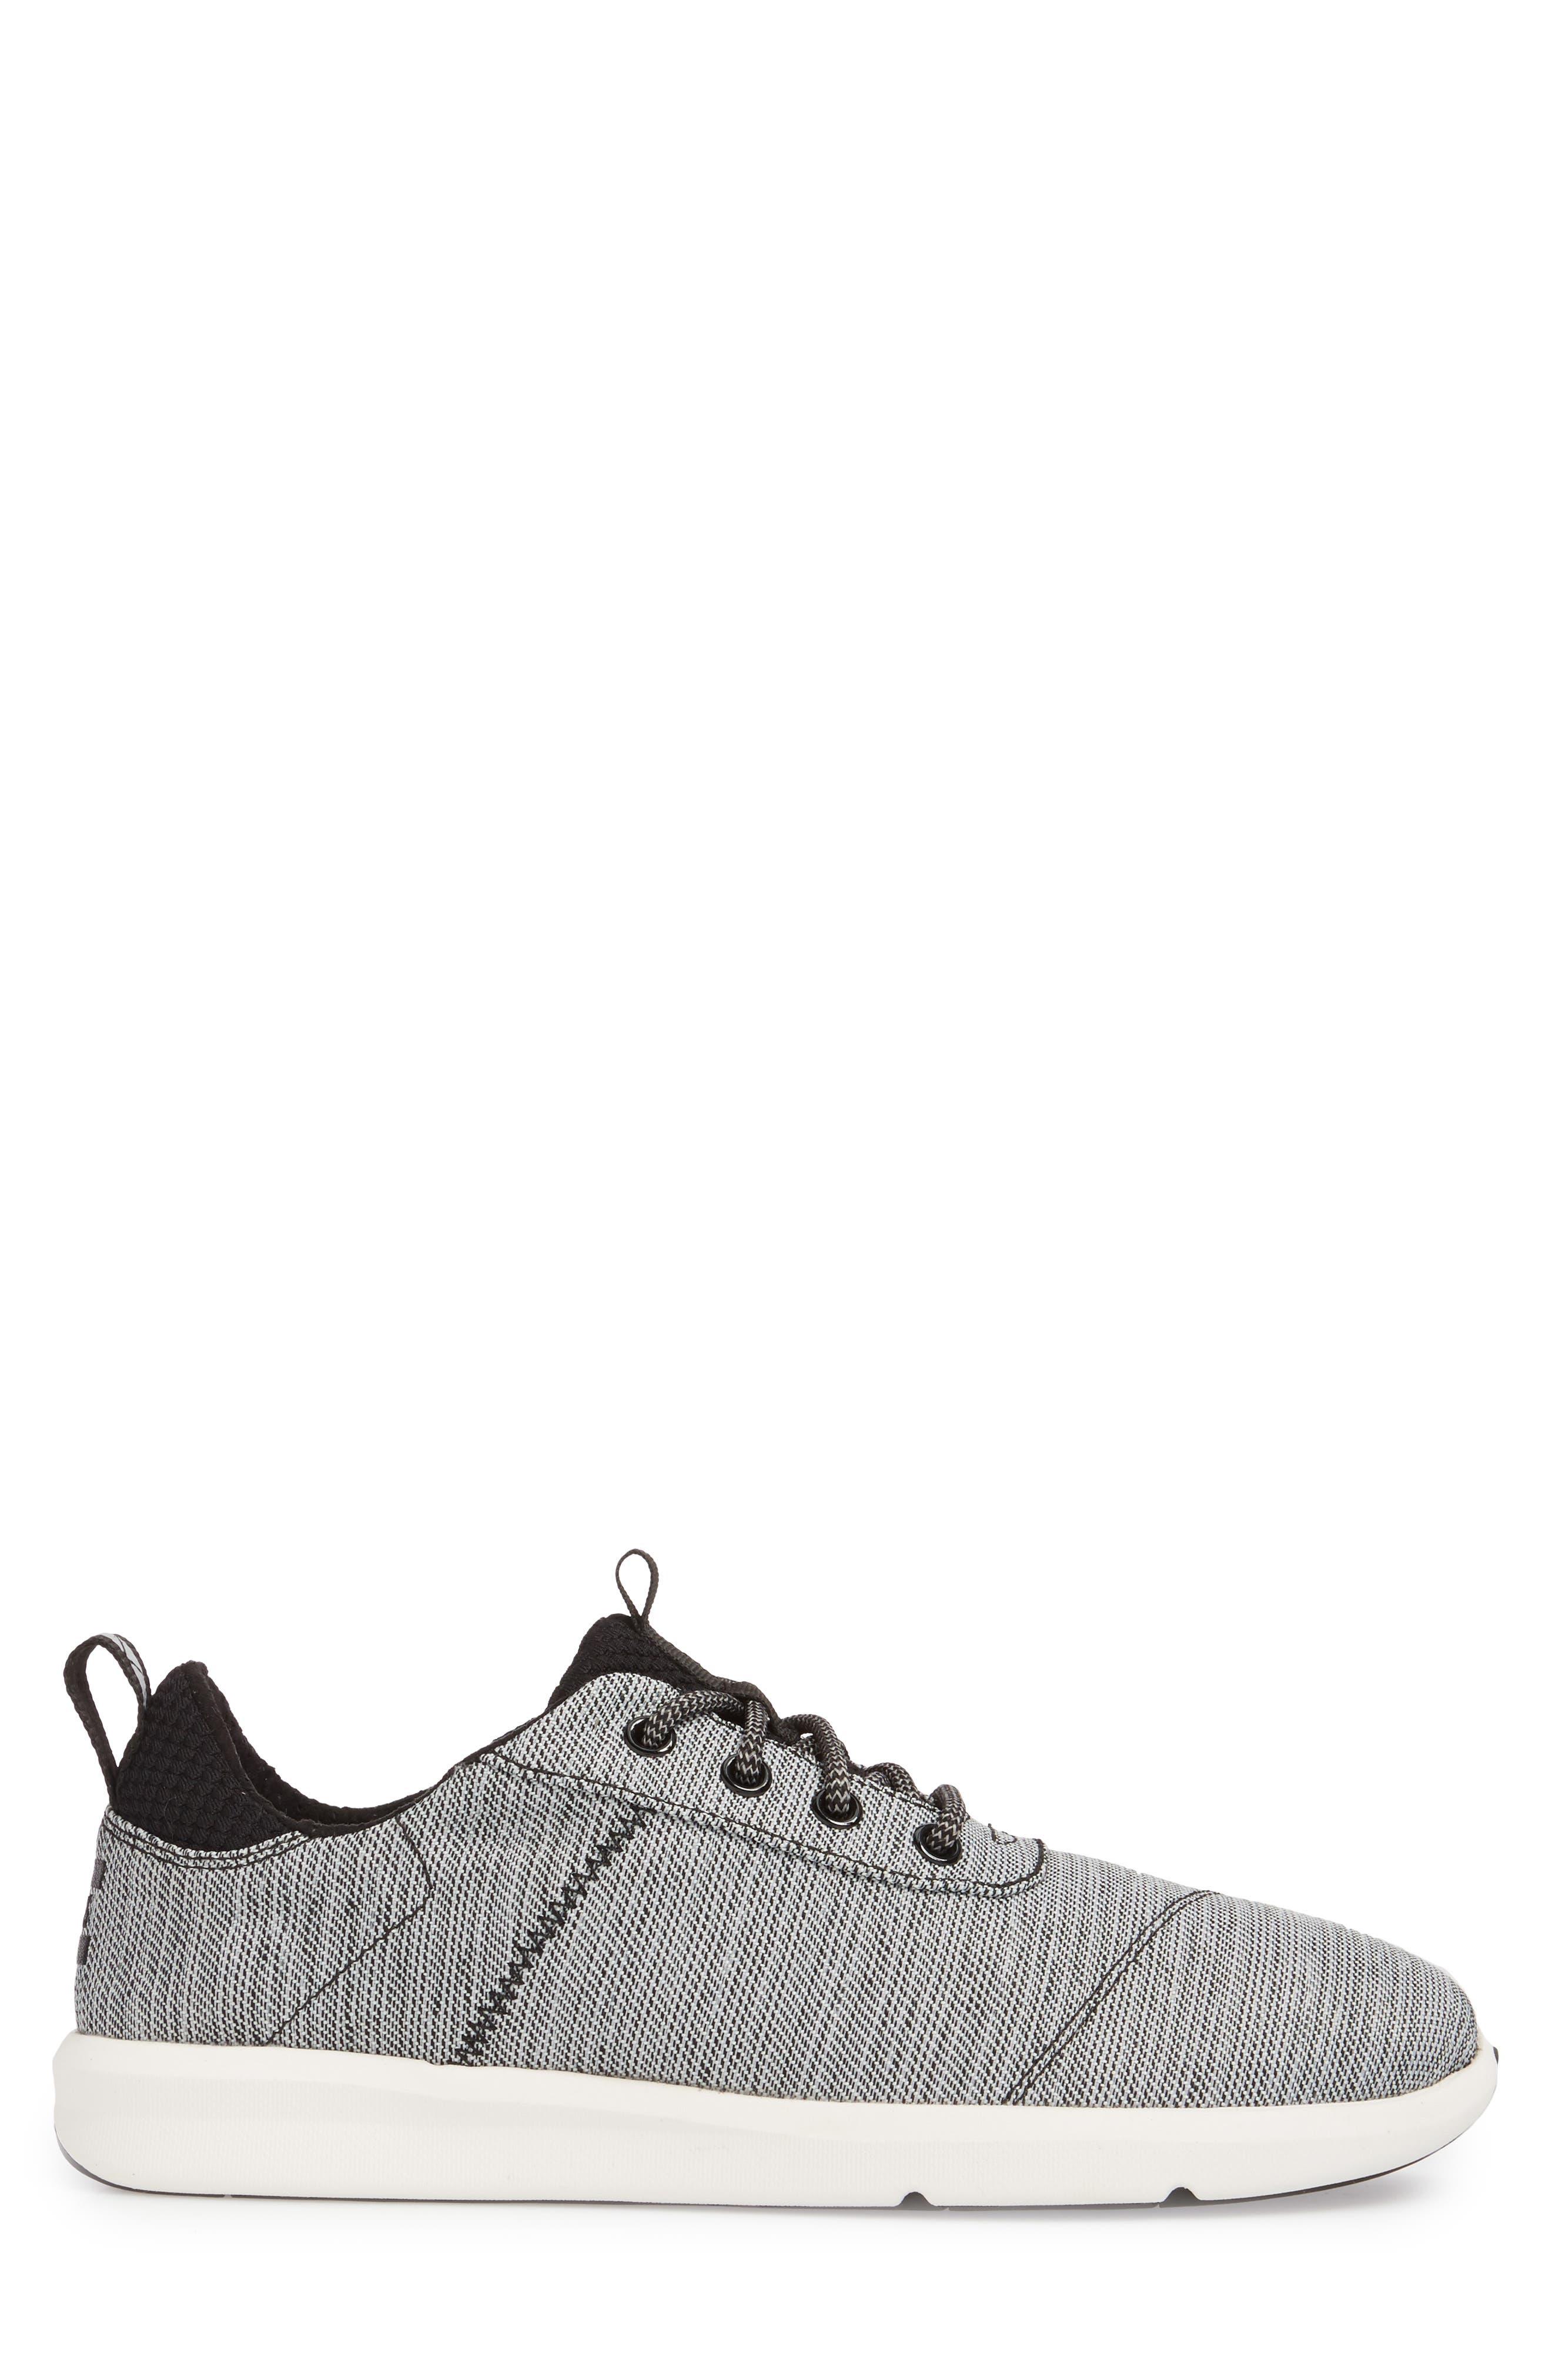 Alternate Image 3  - TOMS Cabrillo Sneaker (Men)